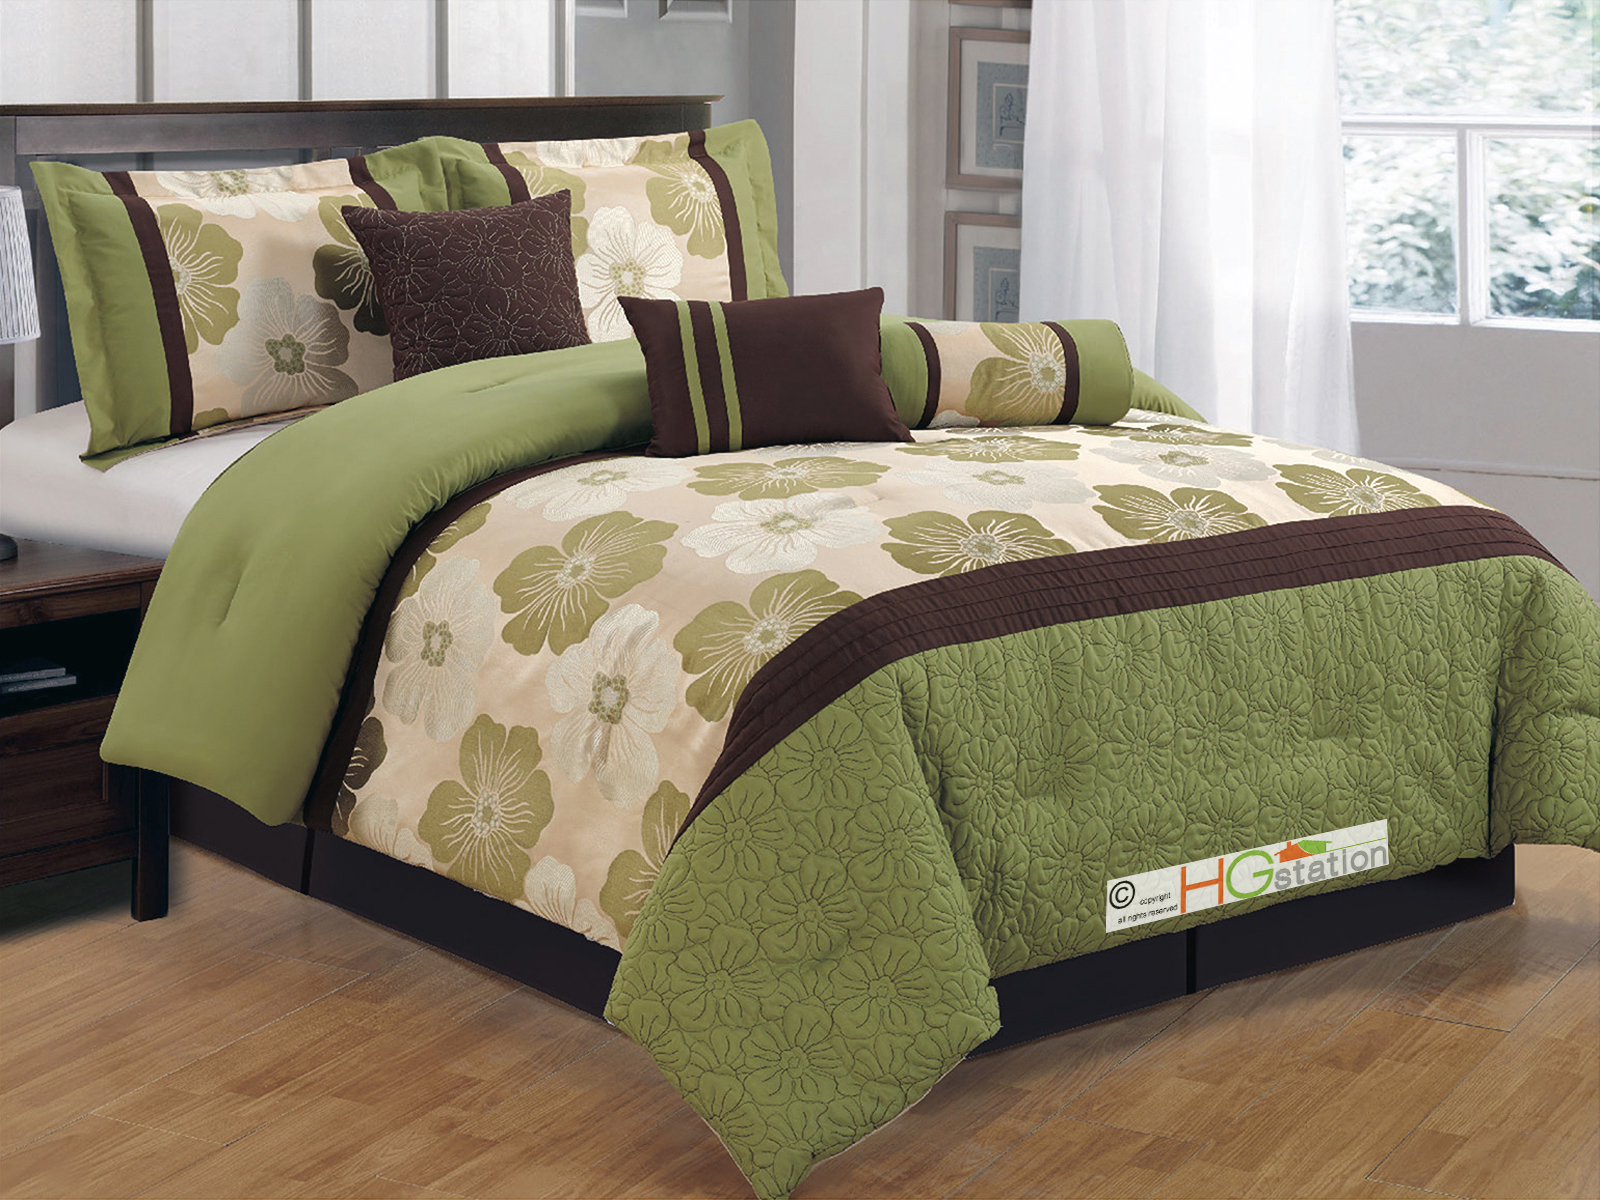 11 Pc Quilted Jacquard Flower Striped Comforter Curtain Set Sage Green Brown Gold Beige Queen Walmart Com Walmart Com